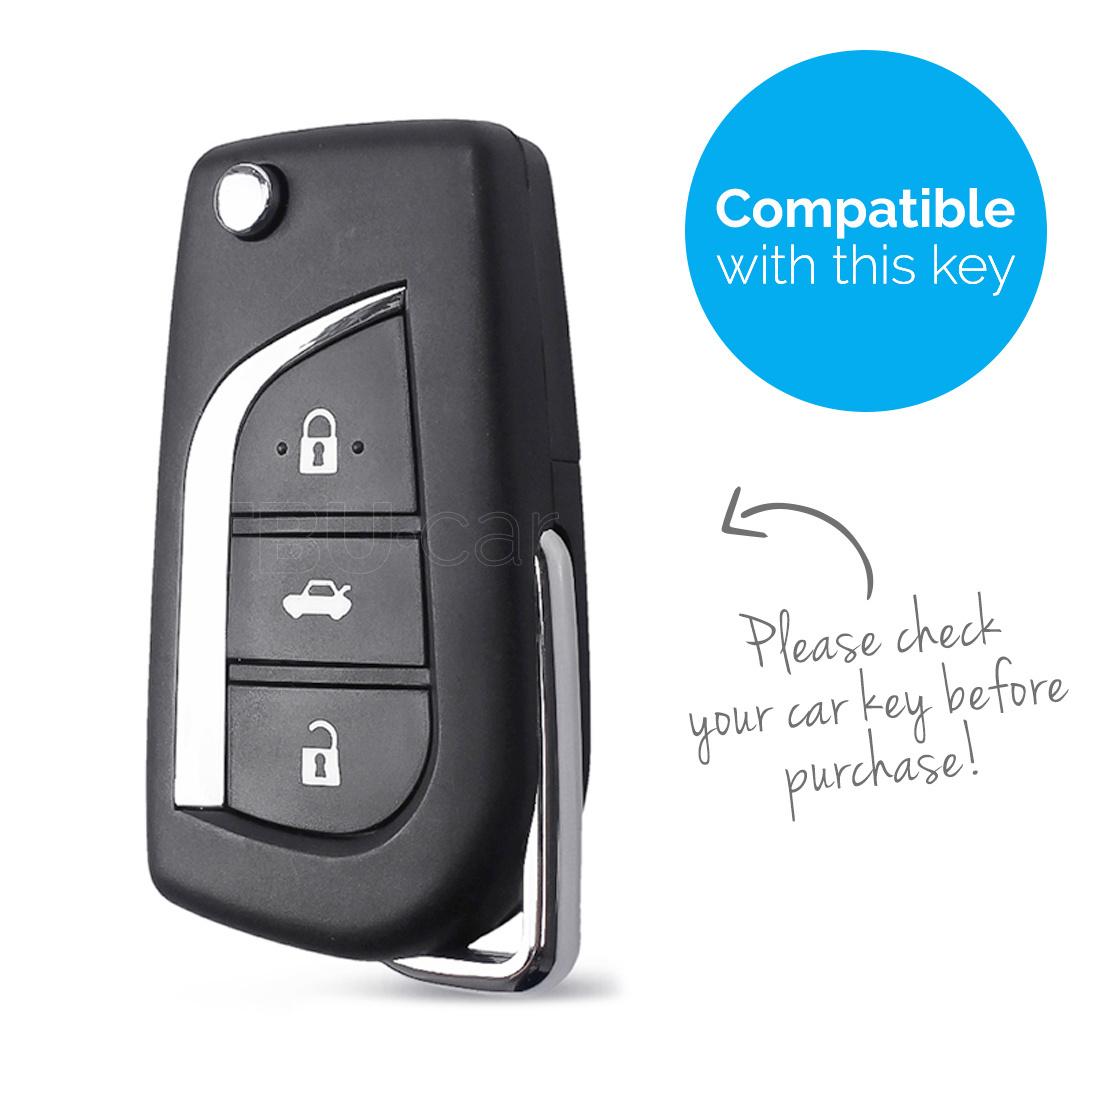 TBU car TBU car Autoschlüssel Hülle kompatibel mit Citroën 3 Tasten - Schutzhülle aus Silikon - Auto Schlüsselhülle Cover in Rosa